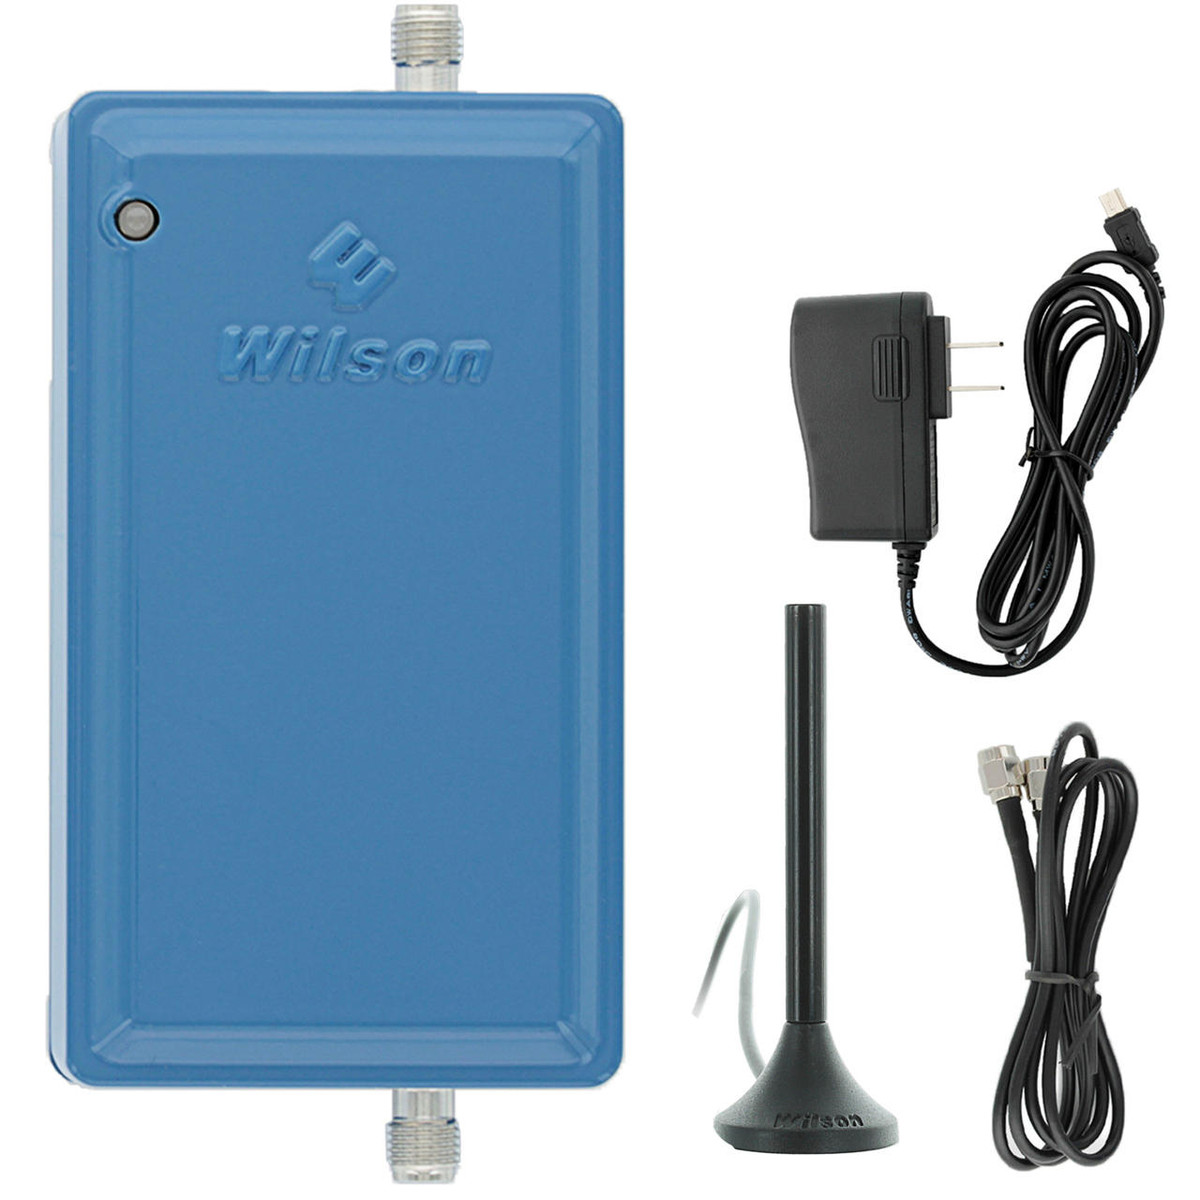 Wilson Electronics Wilson weBoost Signal 3G M2M Signal Booster Mini Mag Kit or 460209